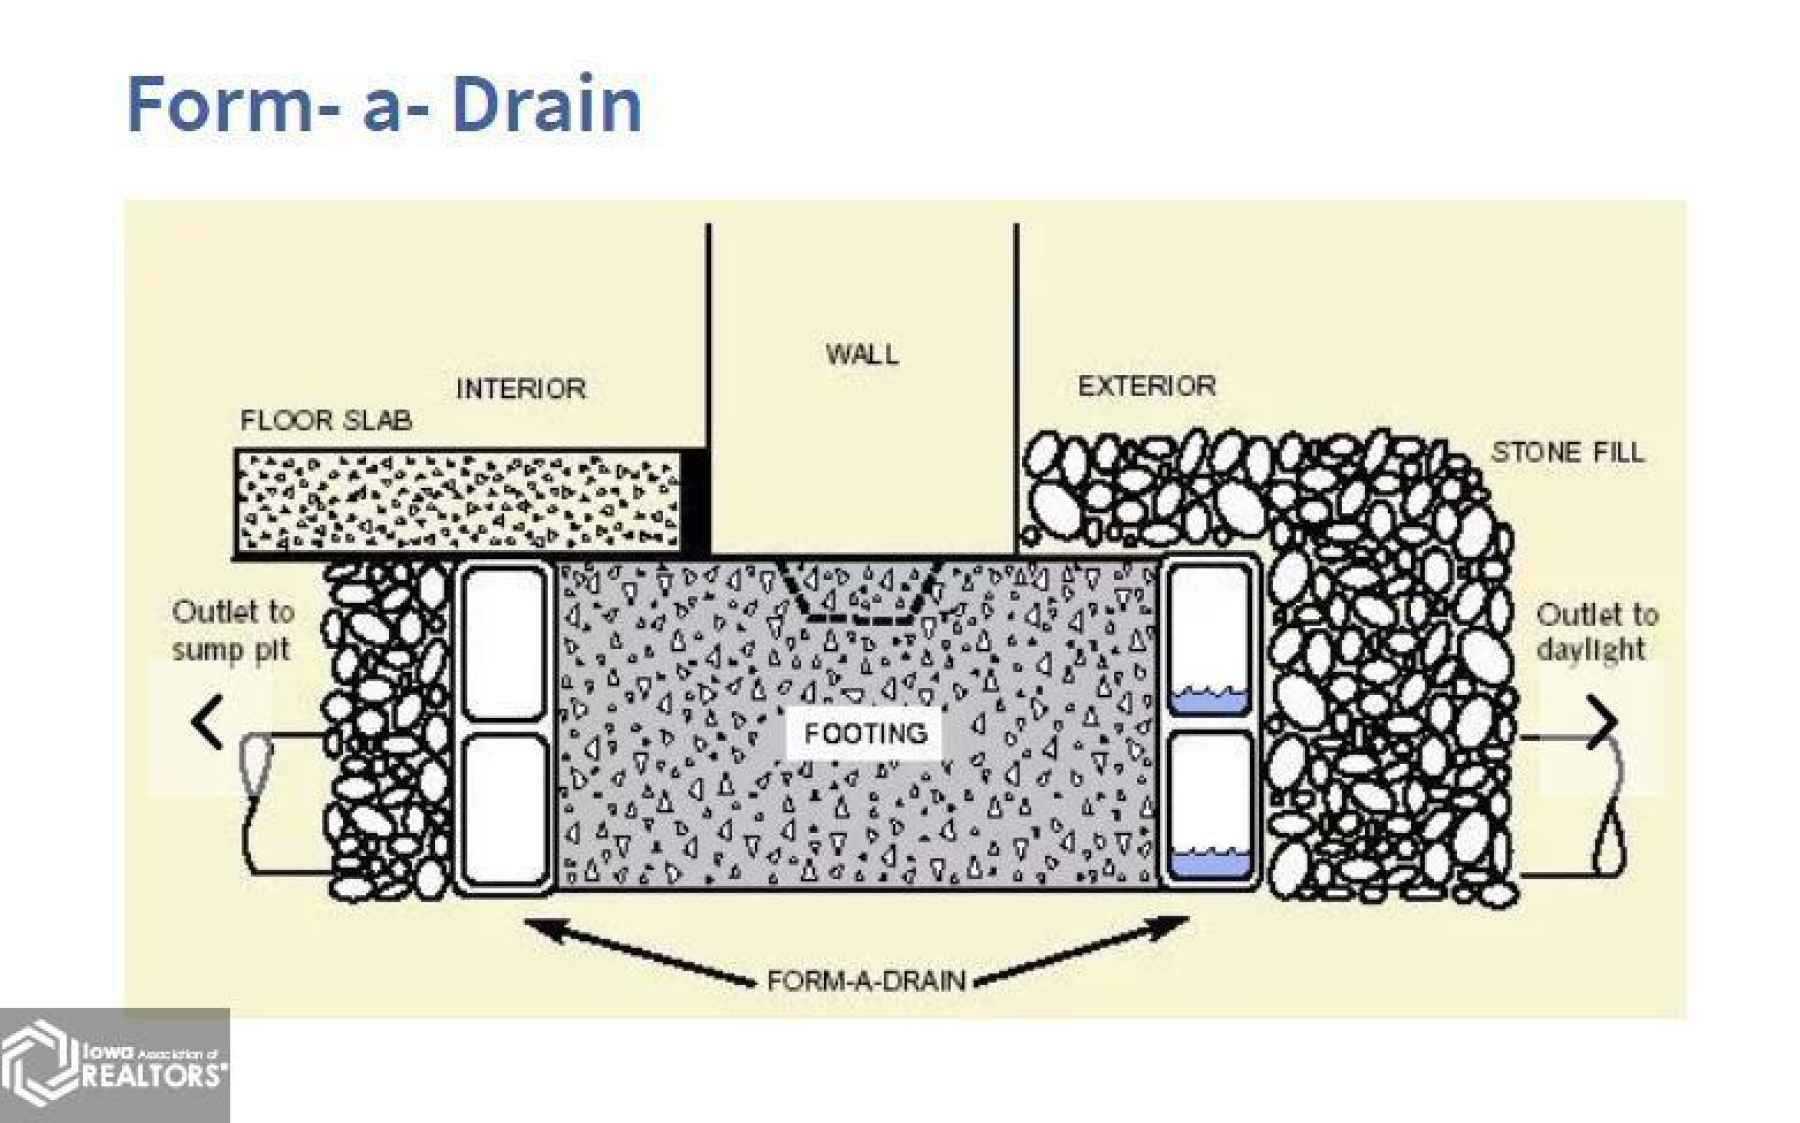 Form a drain